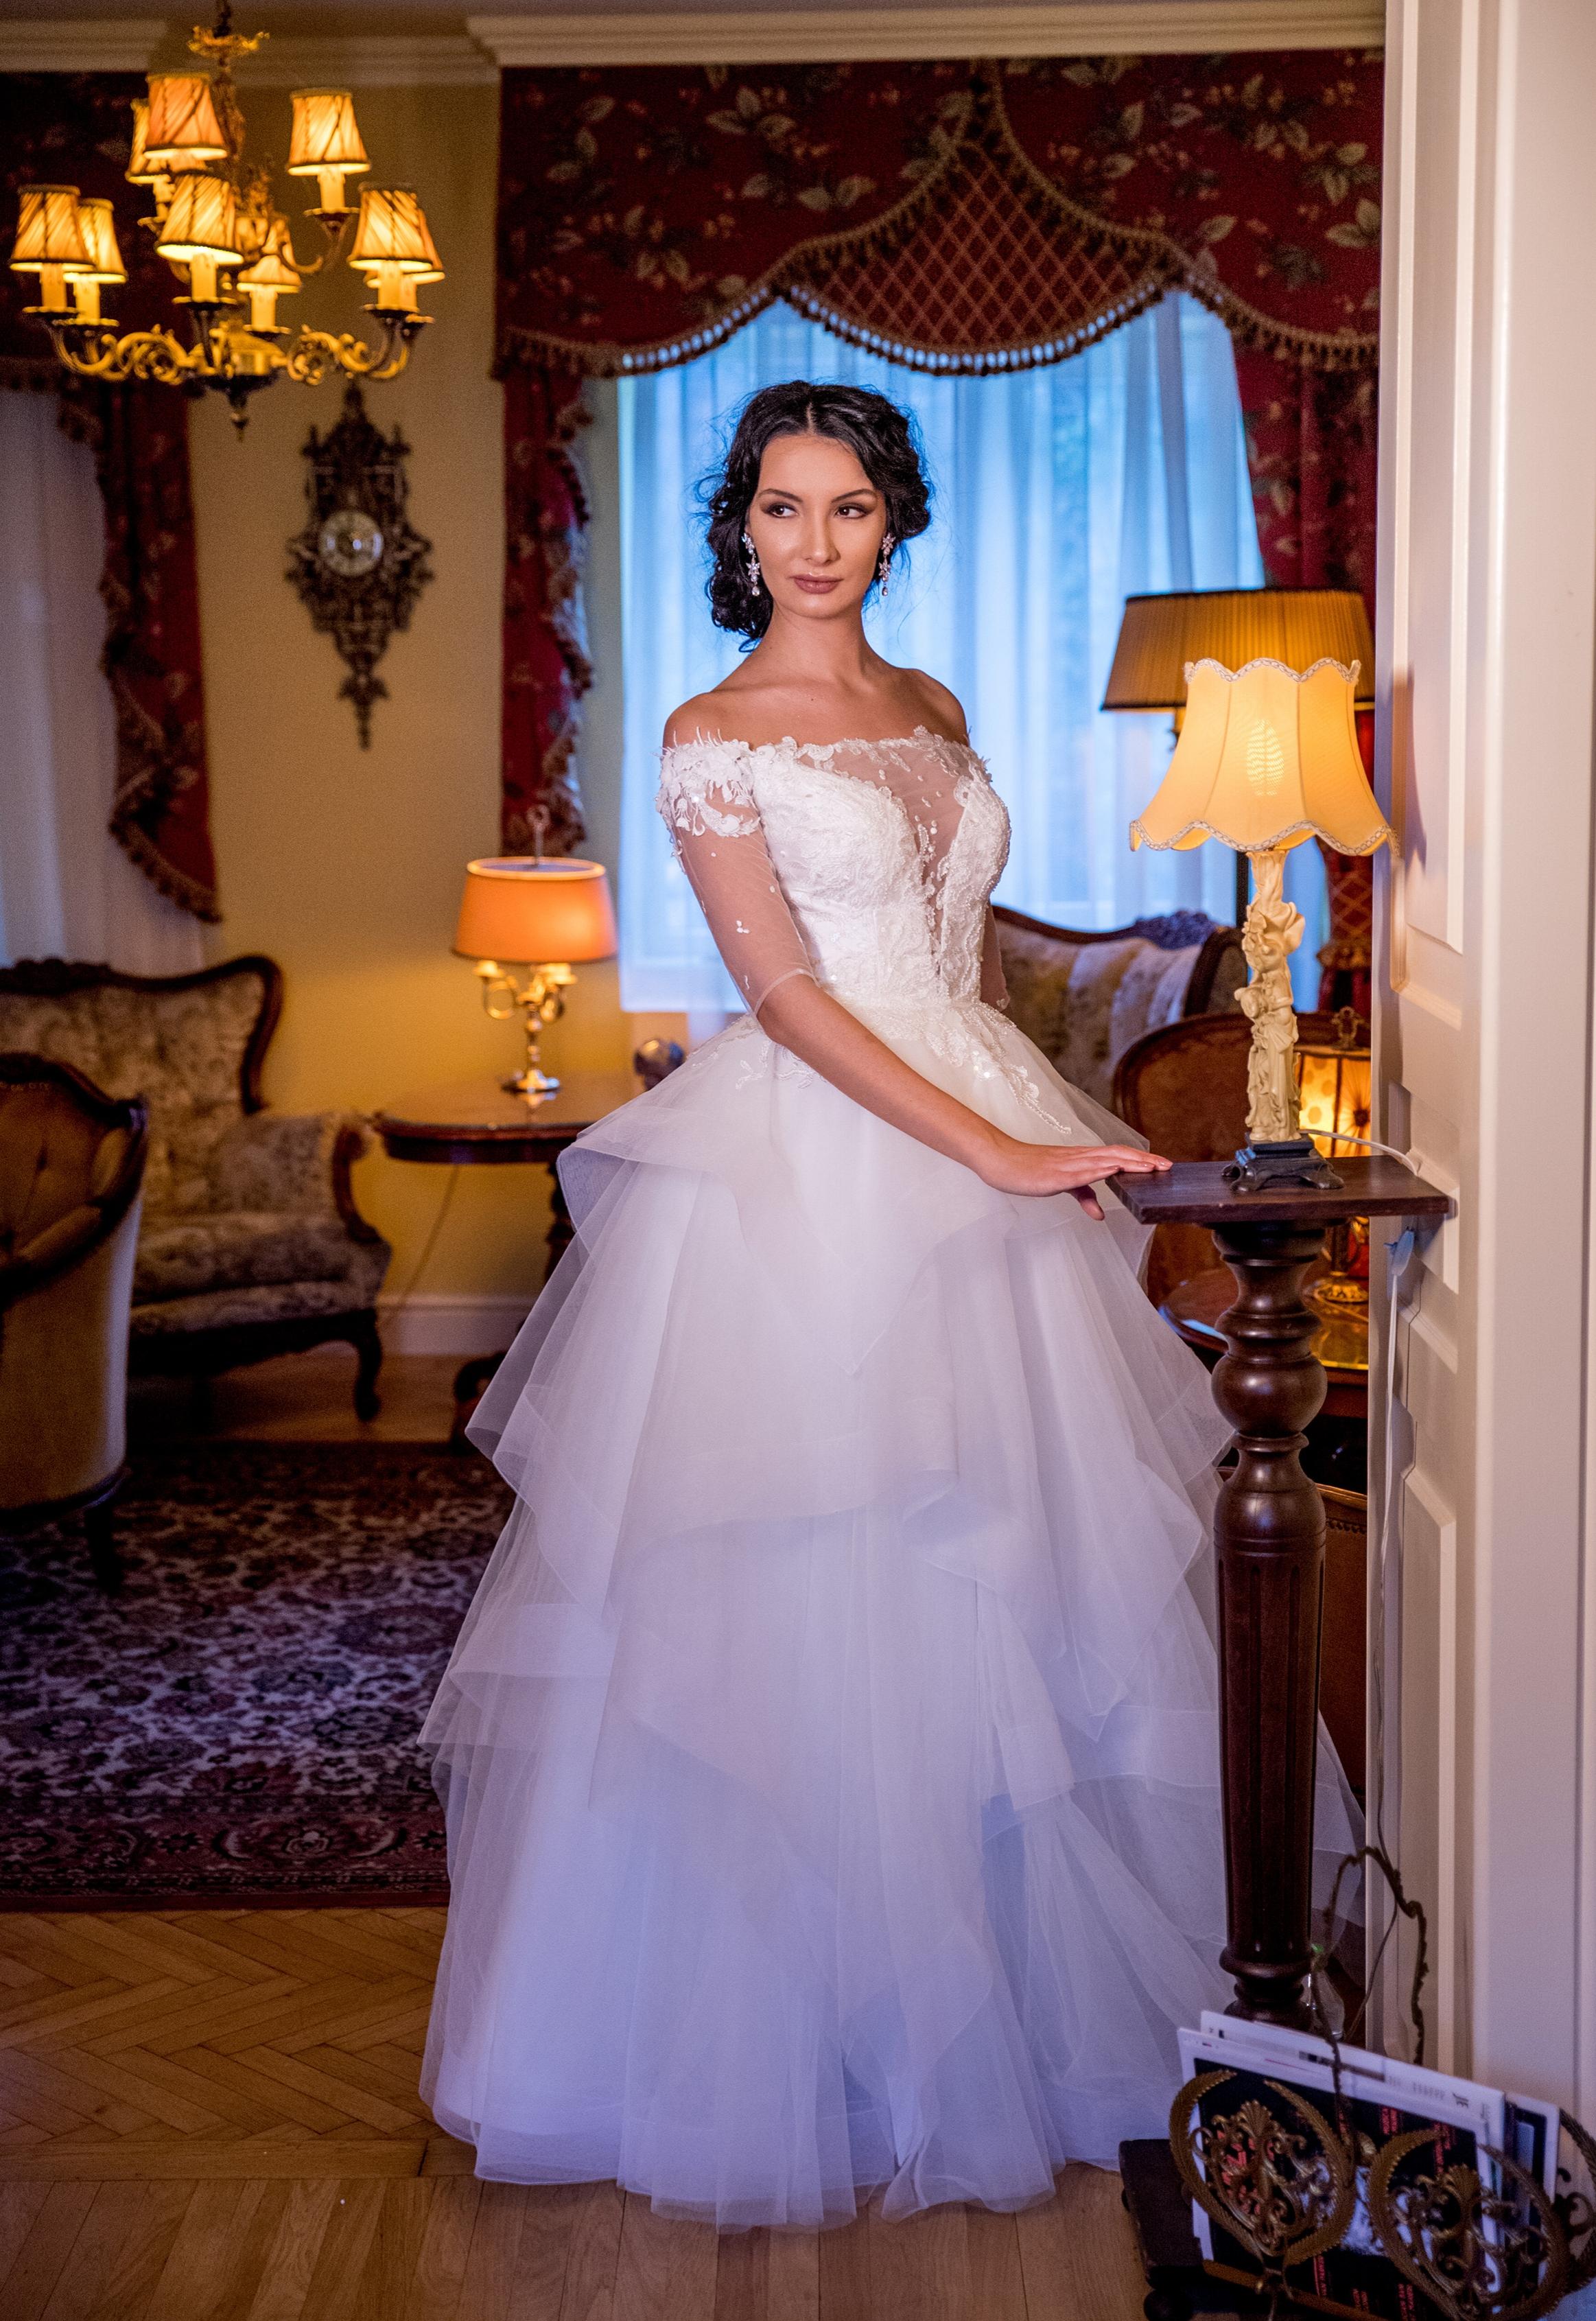 2018 wedding dresses fashion by laina (62).jpg